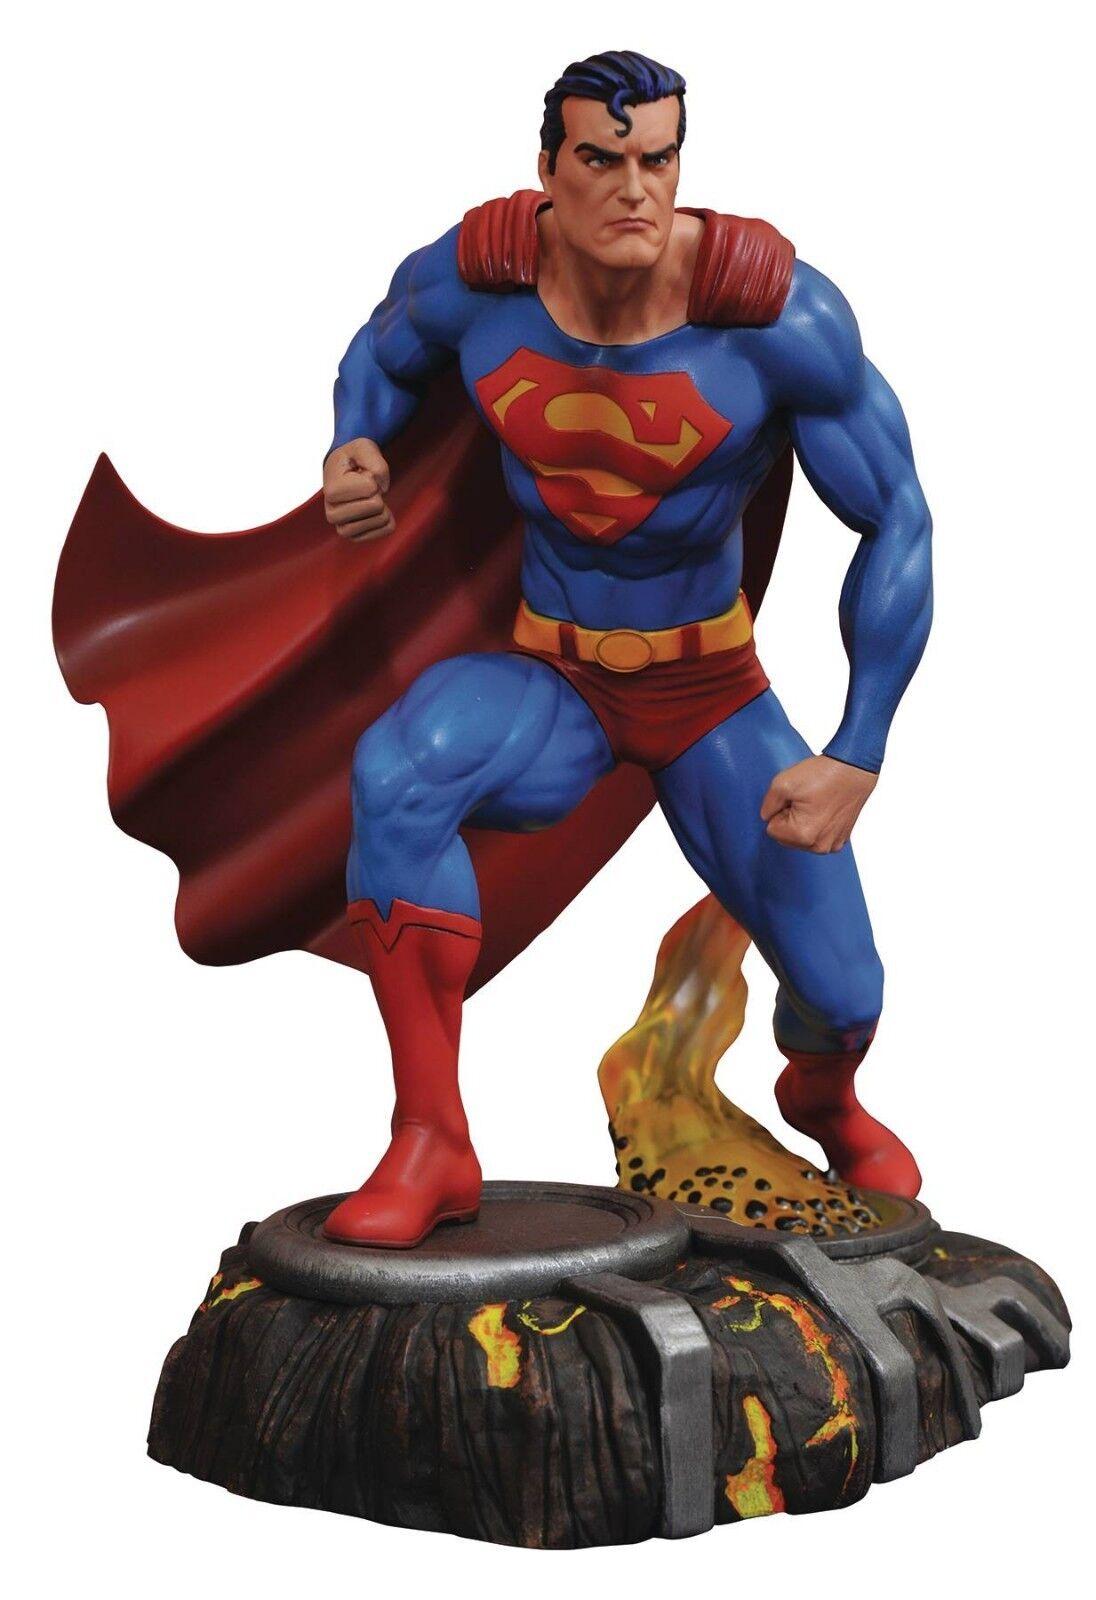 2018 DIAMOND SELECT TOYS DC GALLERY COMICS SUPERMAN 10  PVC STATUE MIB NEW